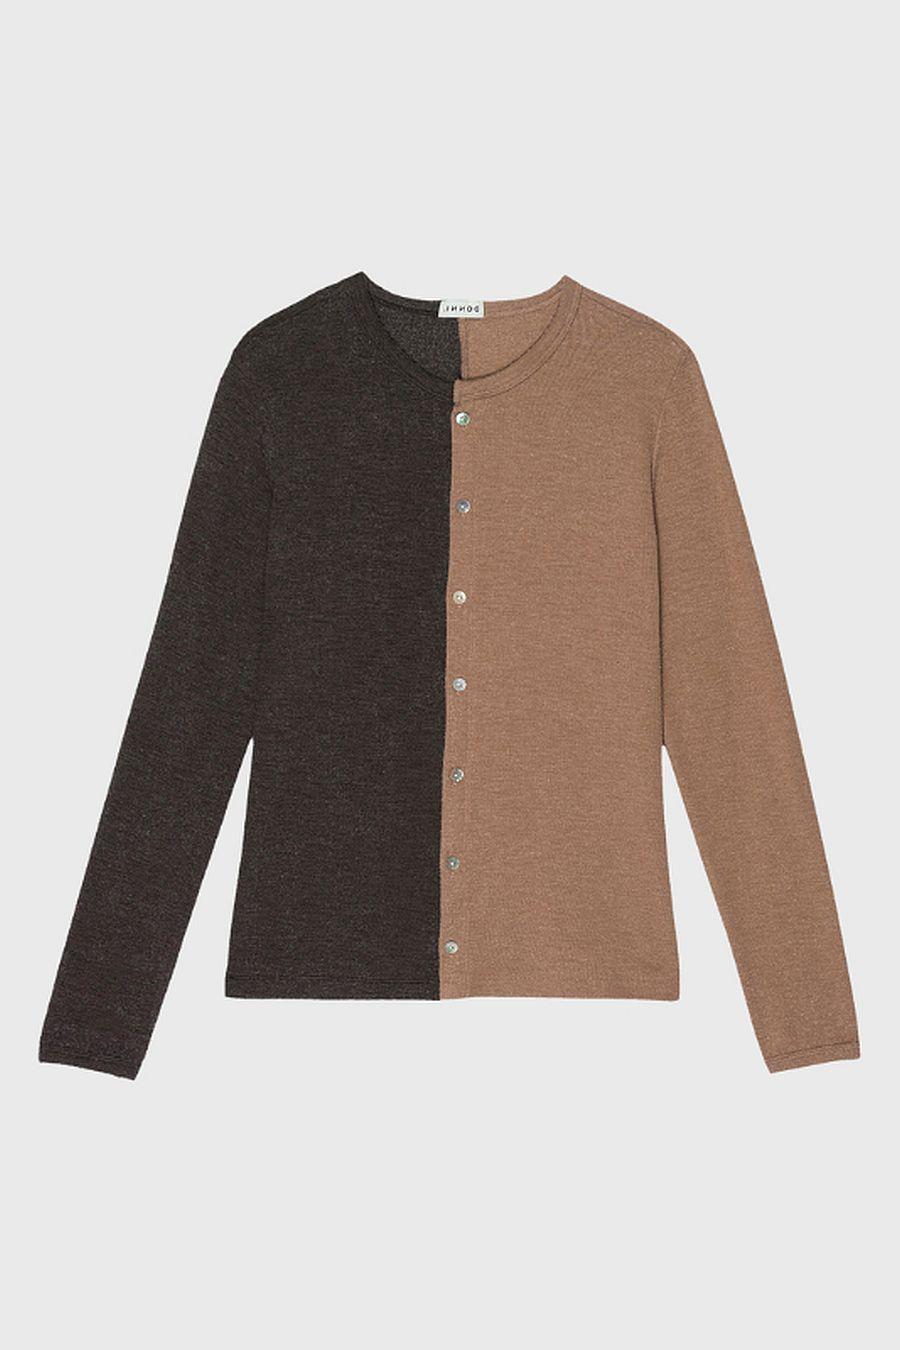 DONNI. Duo Sweater Cardi - Camel/Chocolate